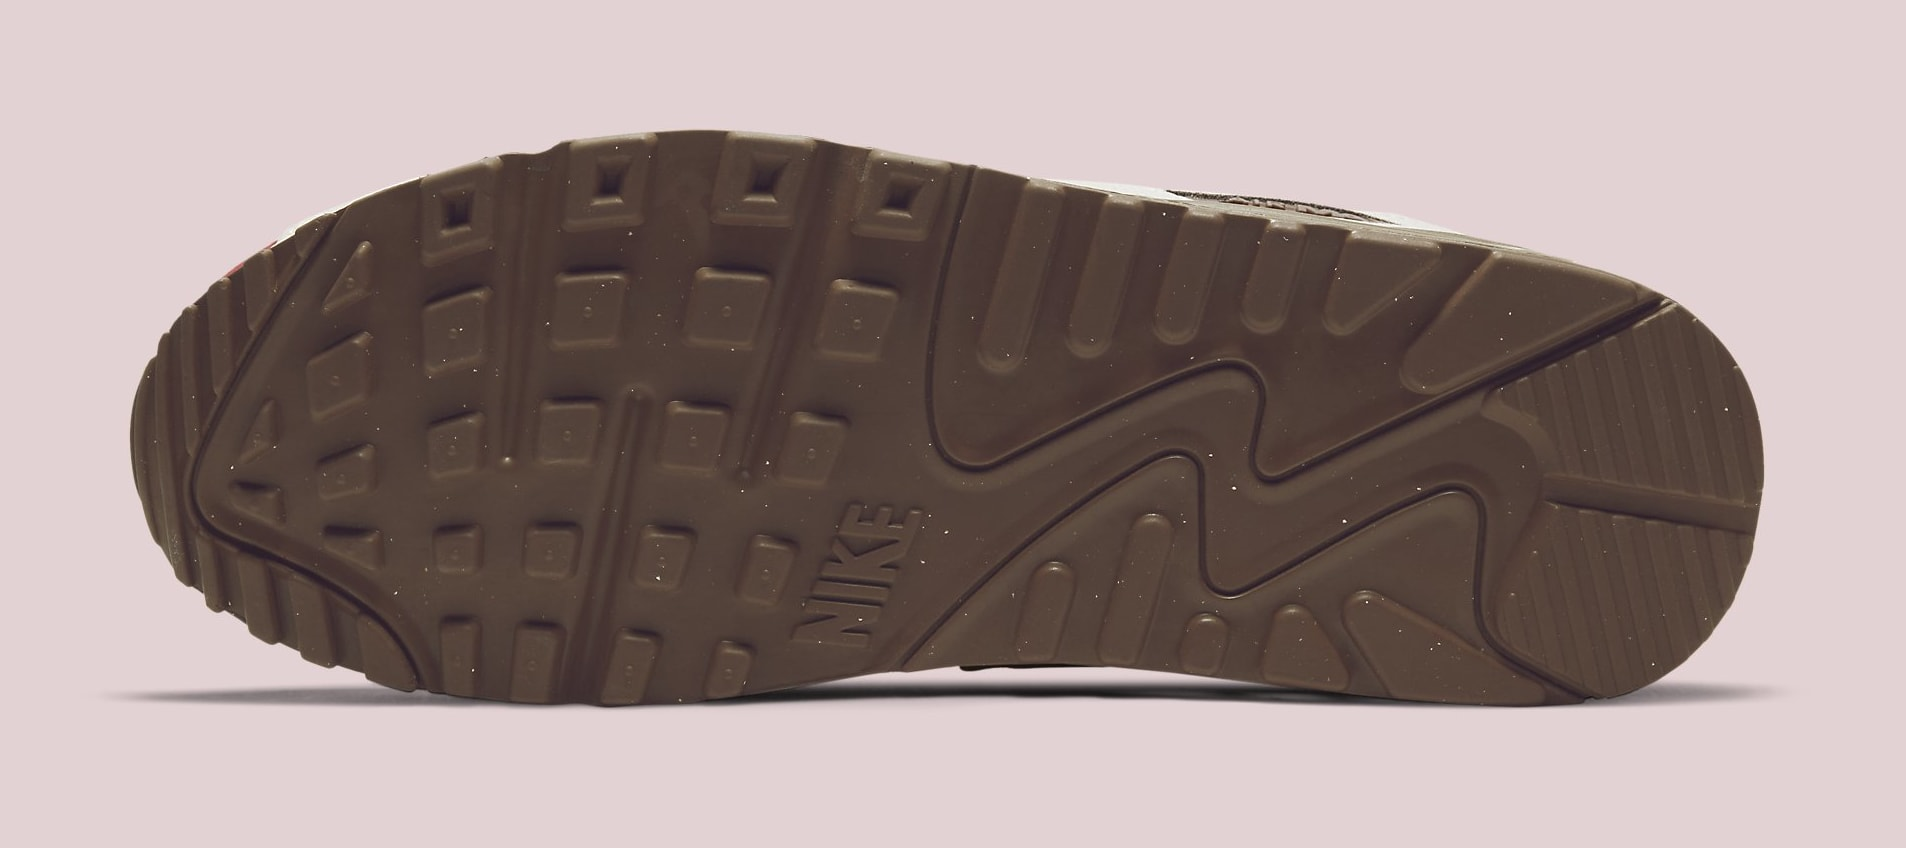 Nike Air Max 90 'Bacon' CU1816-100 Outsole